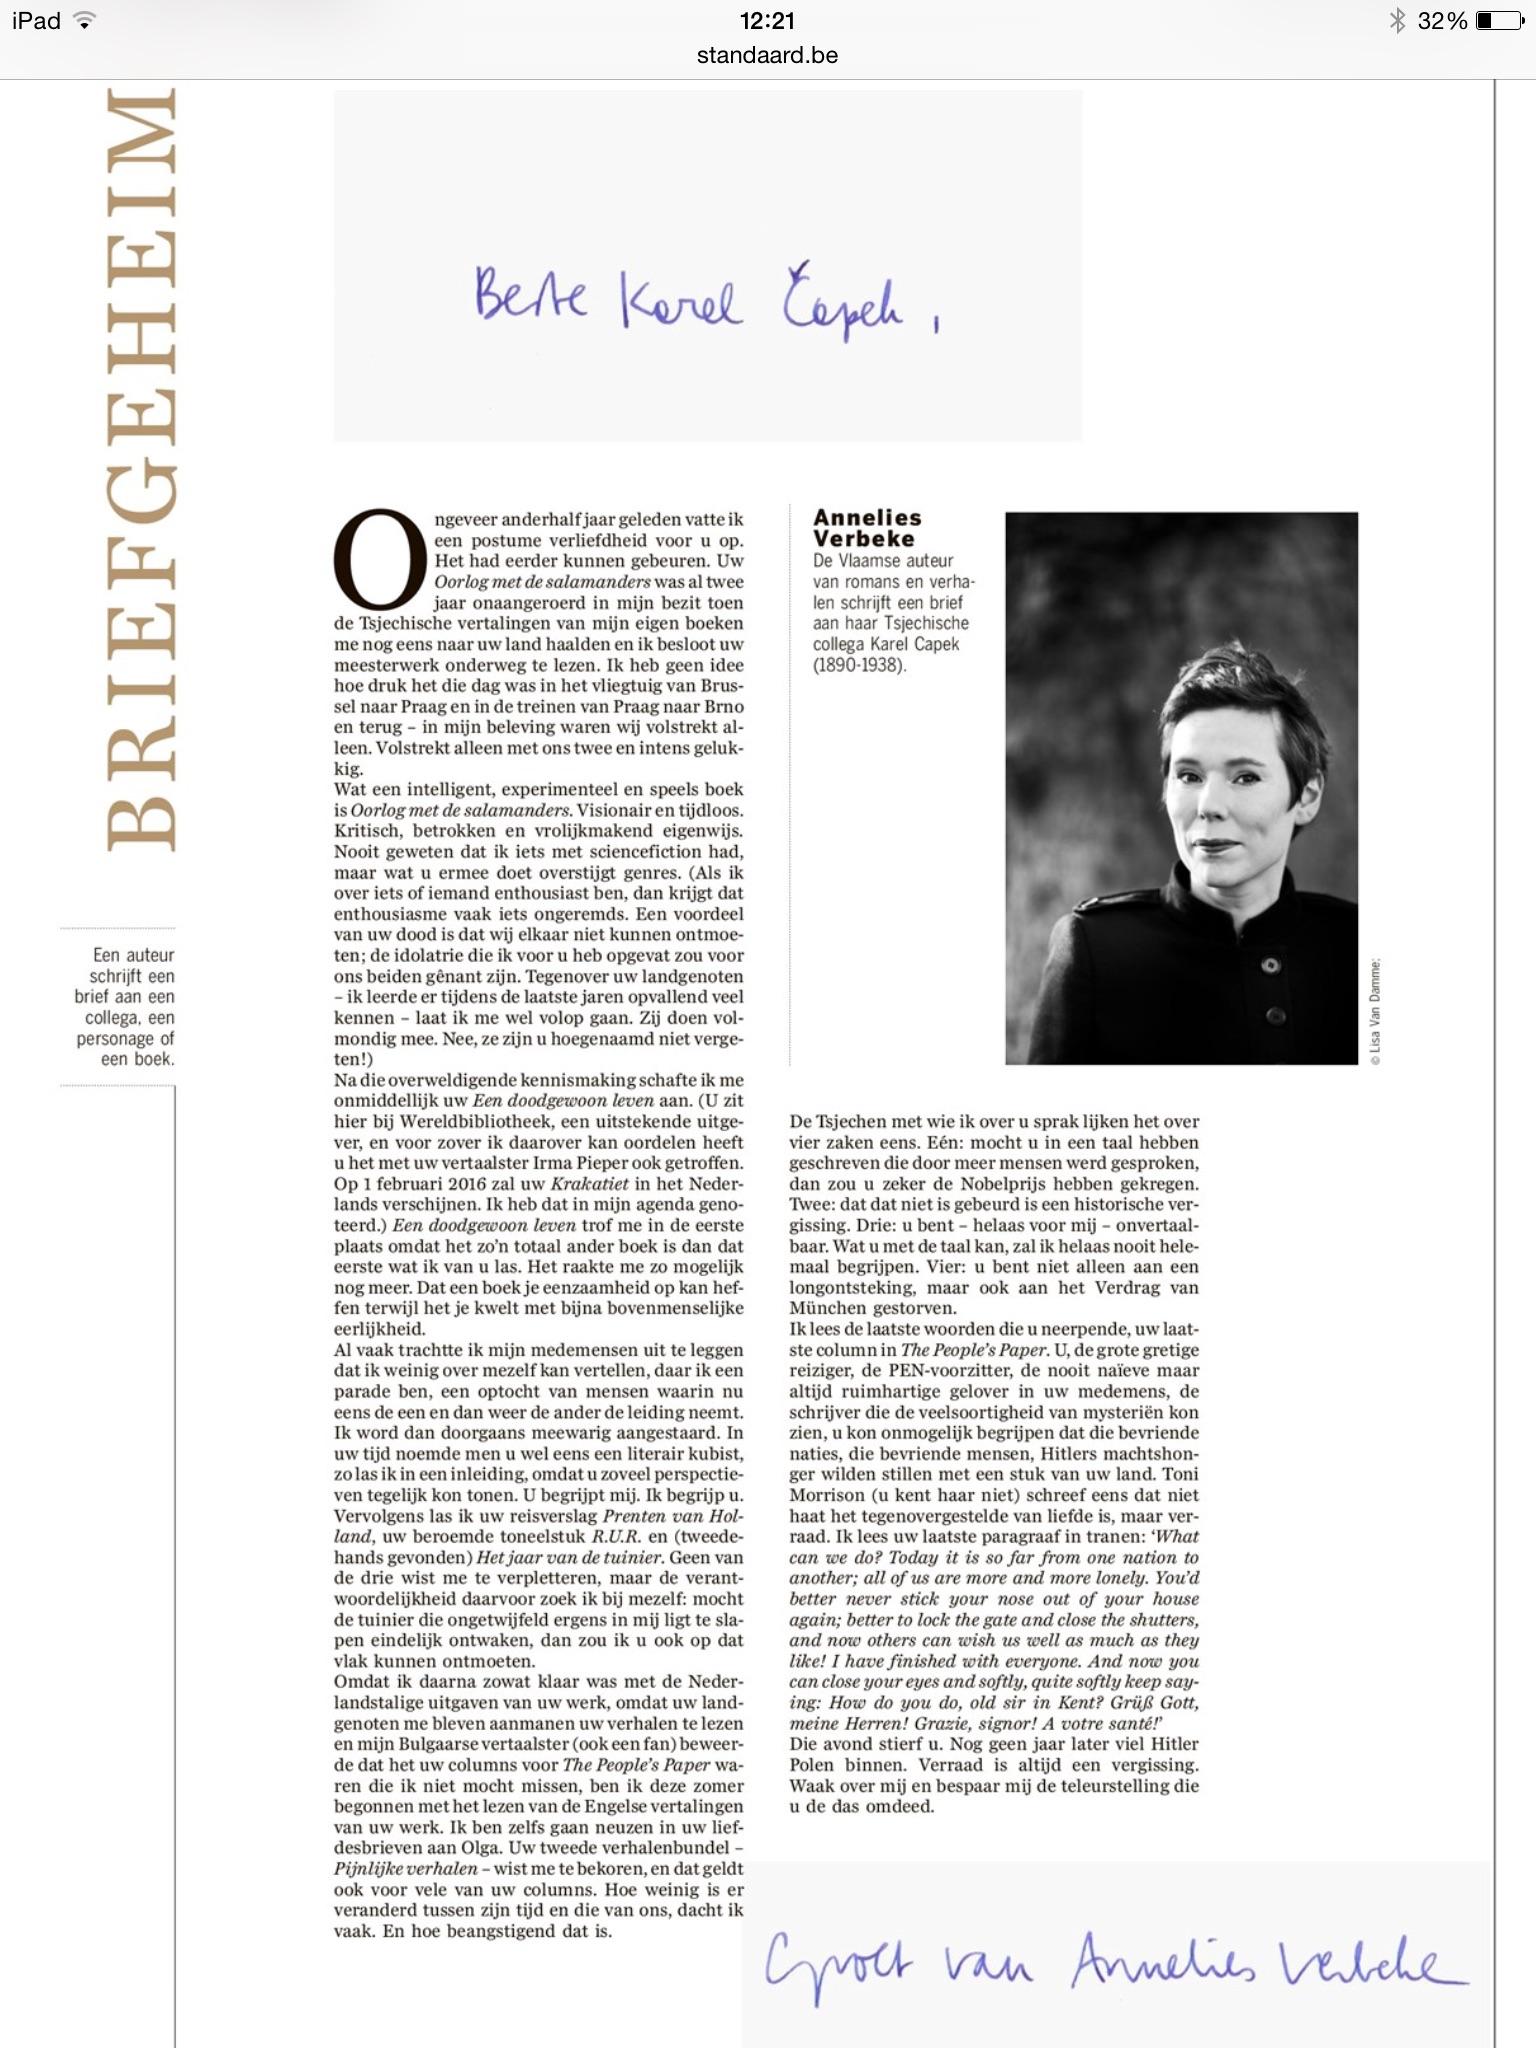 Annelies Verbeke schrijft Karel capek #briefgeheim